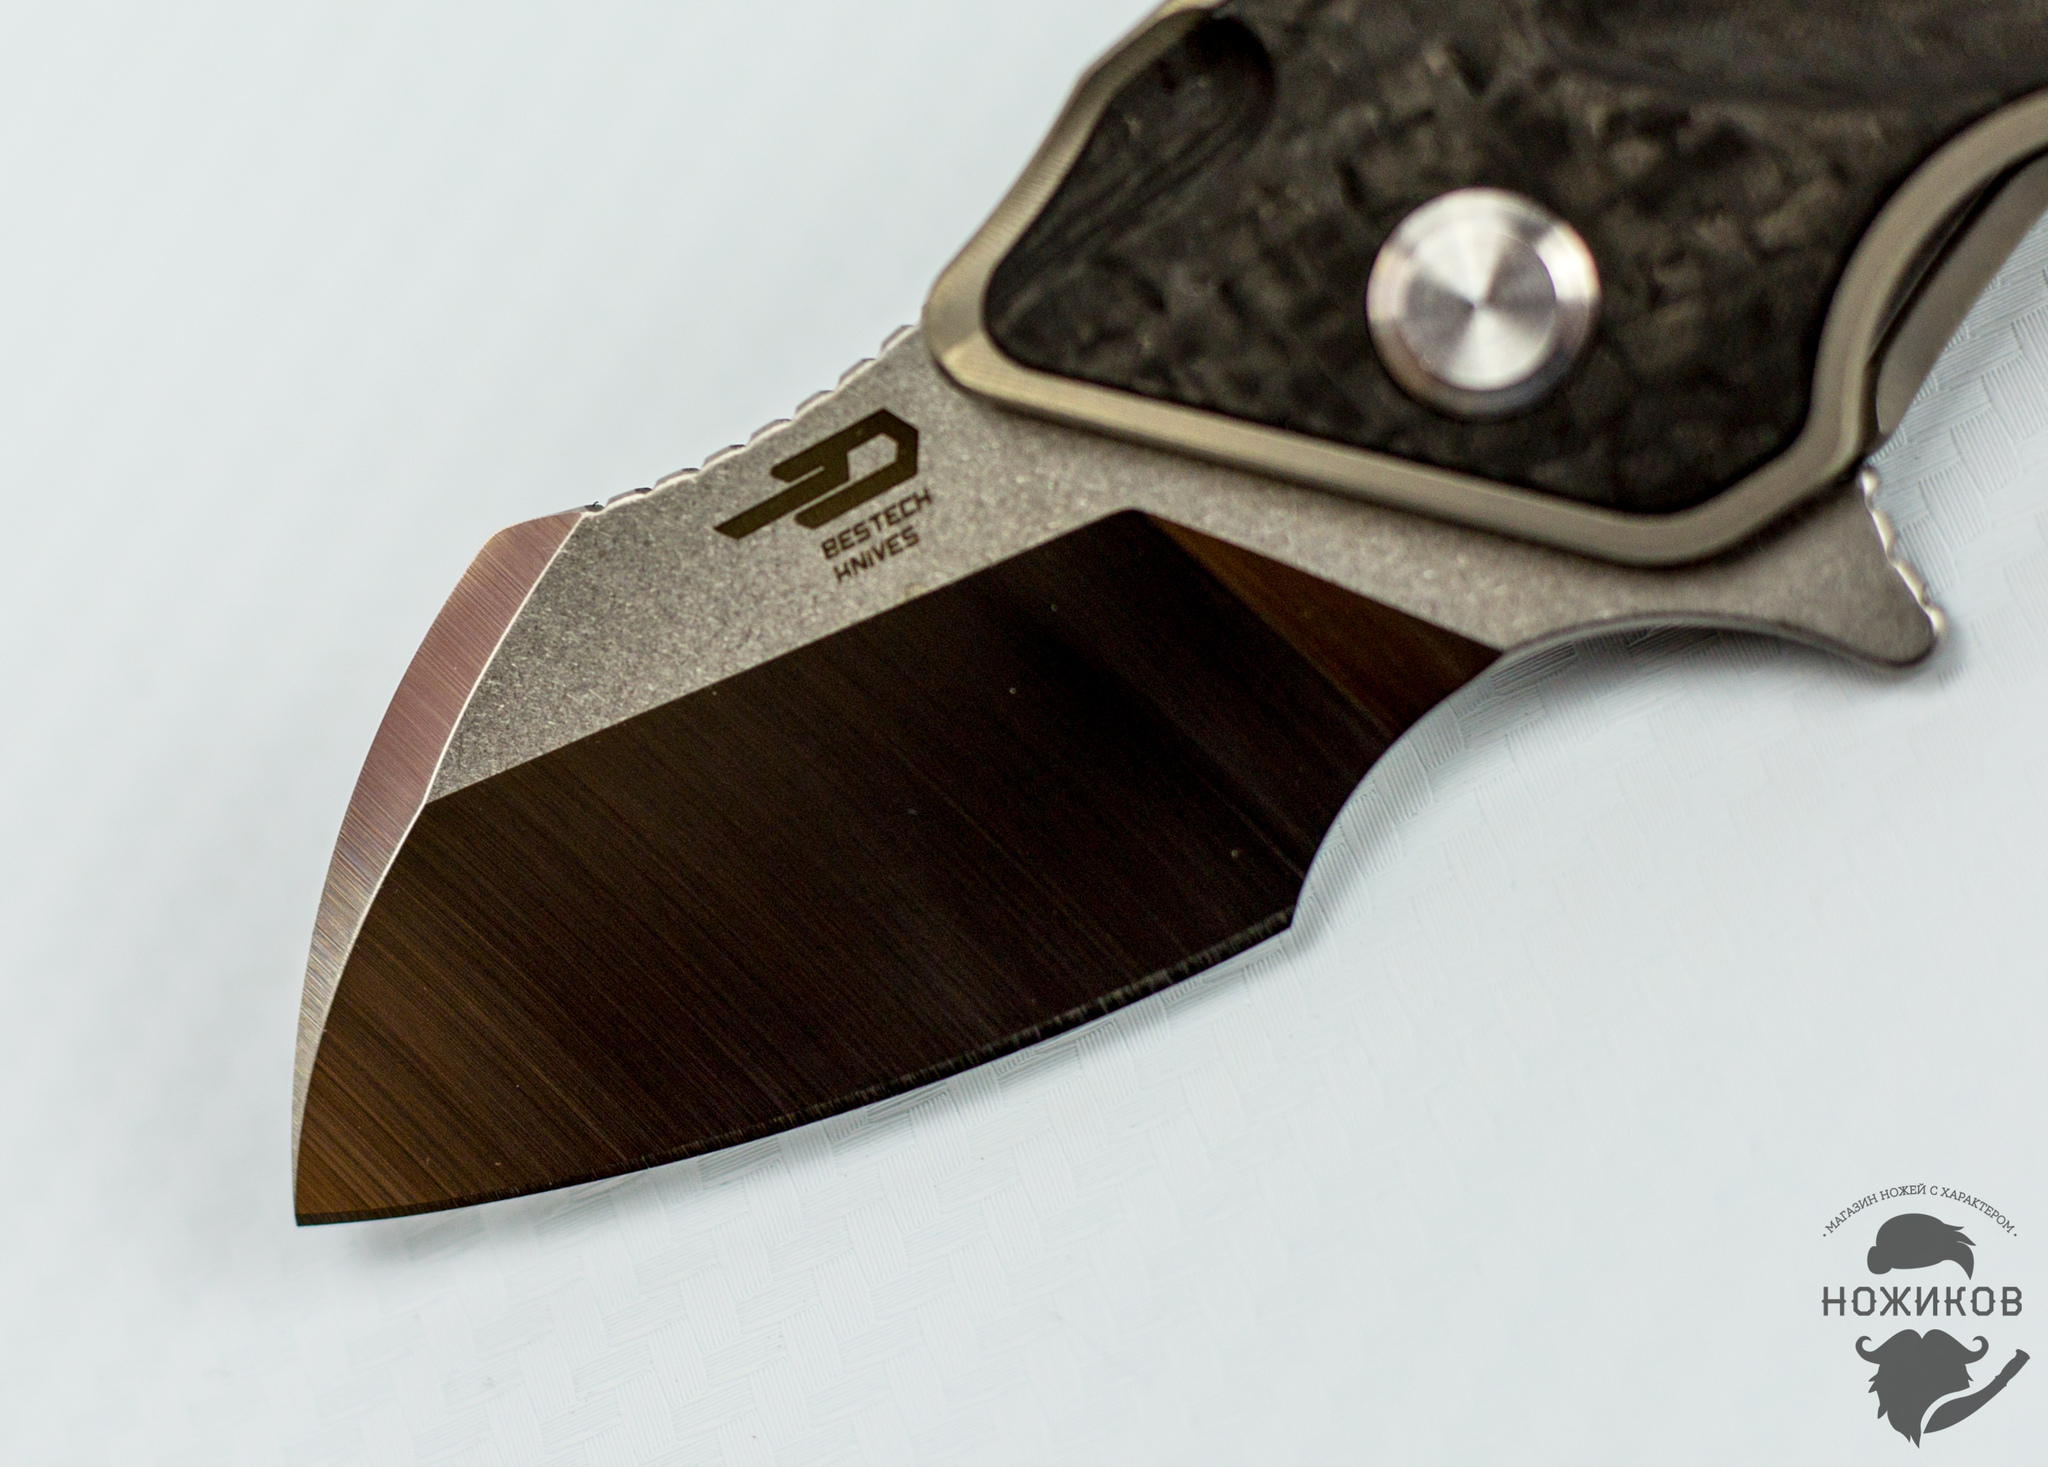 Фото 8 - Складной нож Bestech IMP BT1710A, сталь CPM-S35VN, рукоять титан от Bestech Knives